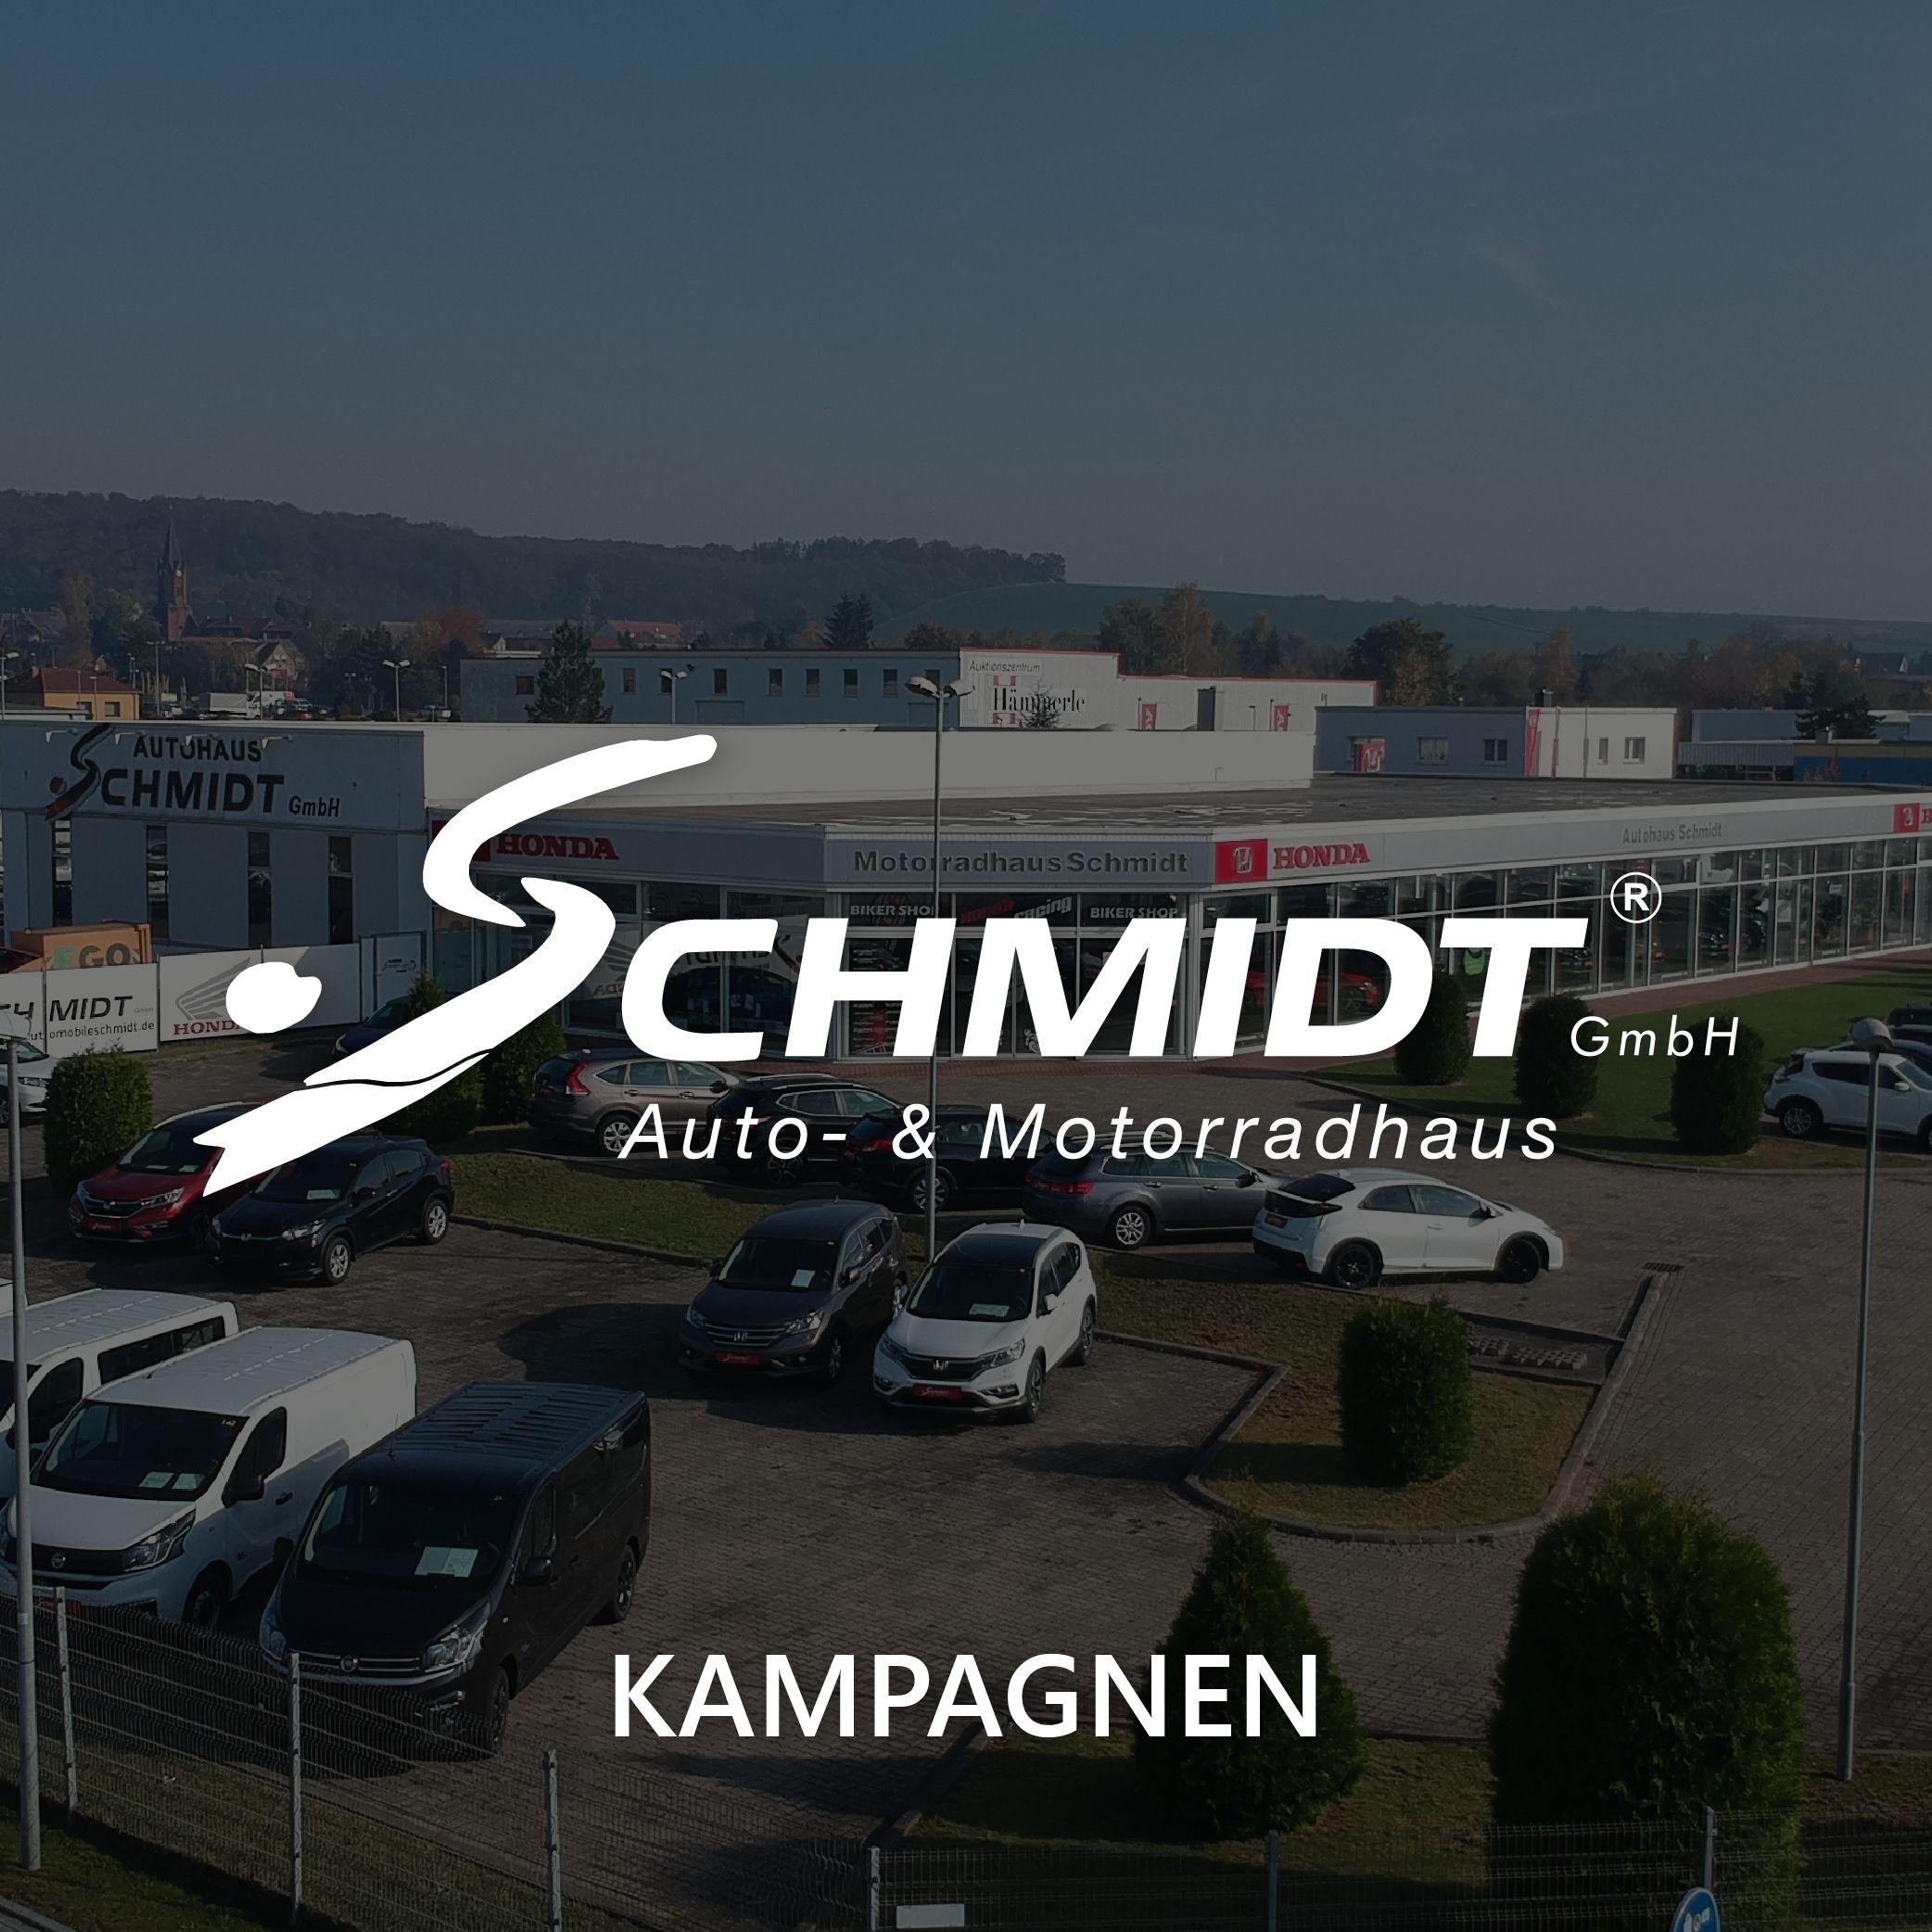 Autohaus Schmidt Kampagne